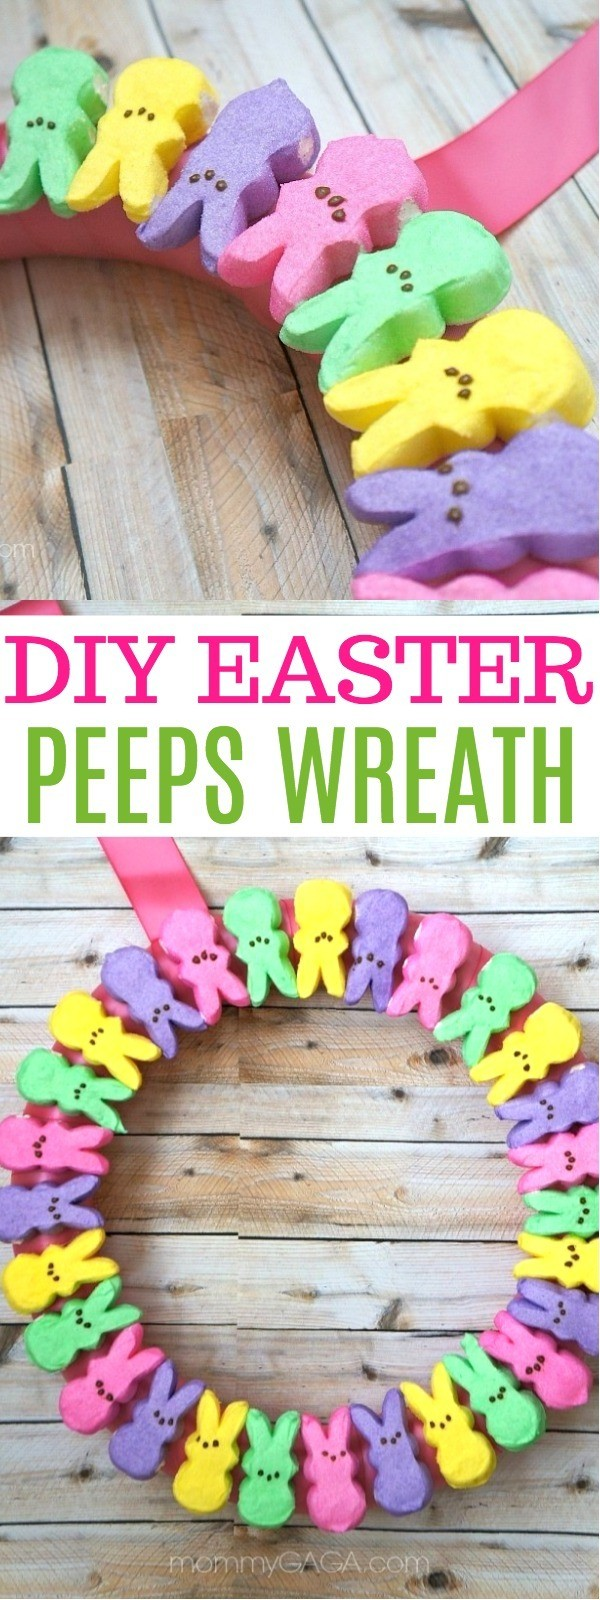 This Easy DIY Easter PEEPS Wreath Is The Cutest Ive Ever Seen! | spring wreaths | diy spring wreath | easter wreaths | spring door wreaths | diy easter wreaths | homemade spring wreath | diy easter decor | honeyandlime.c